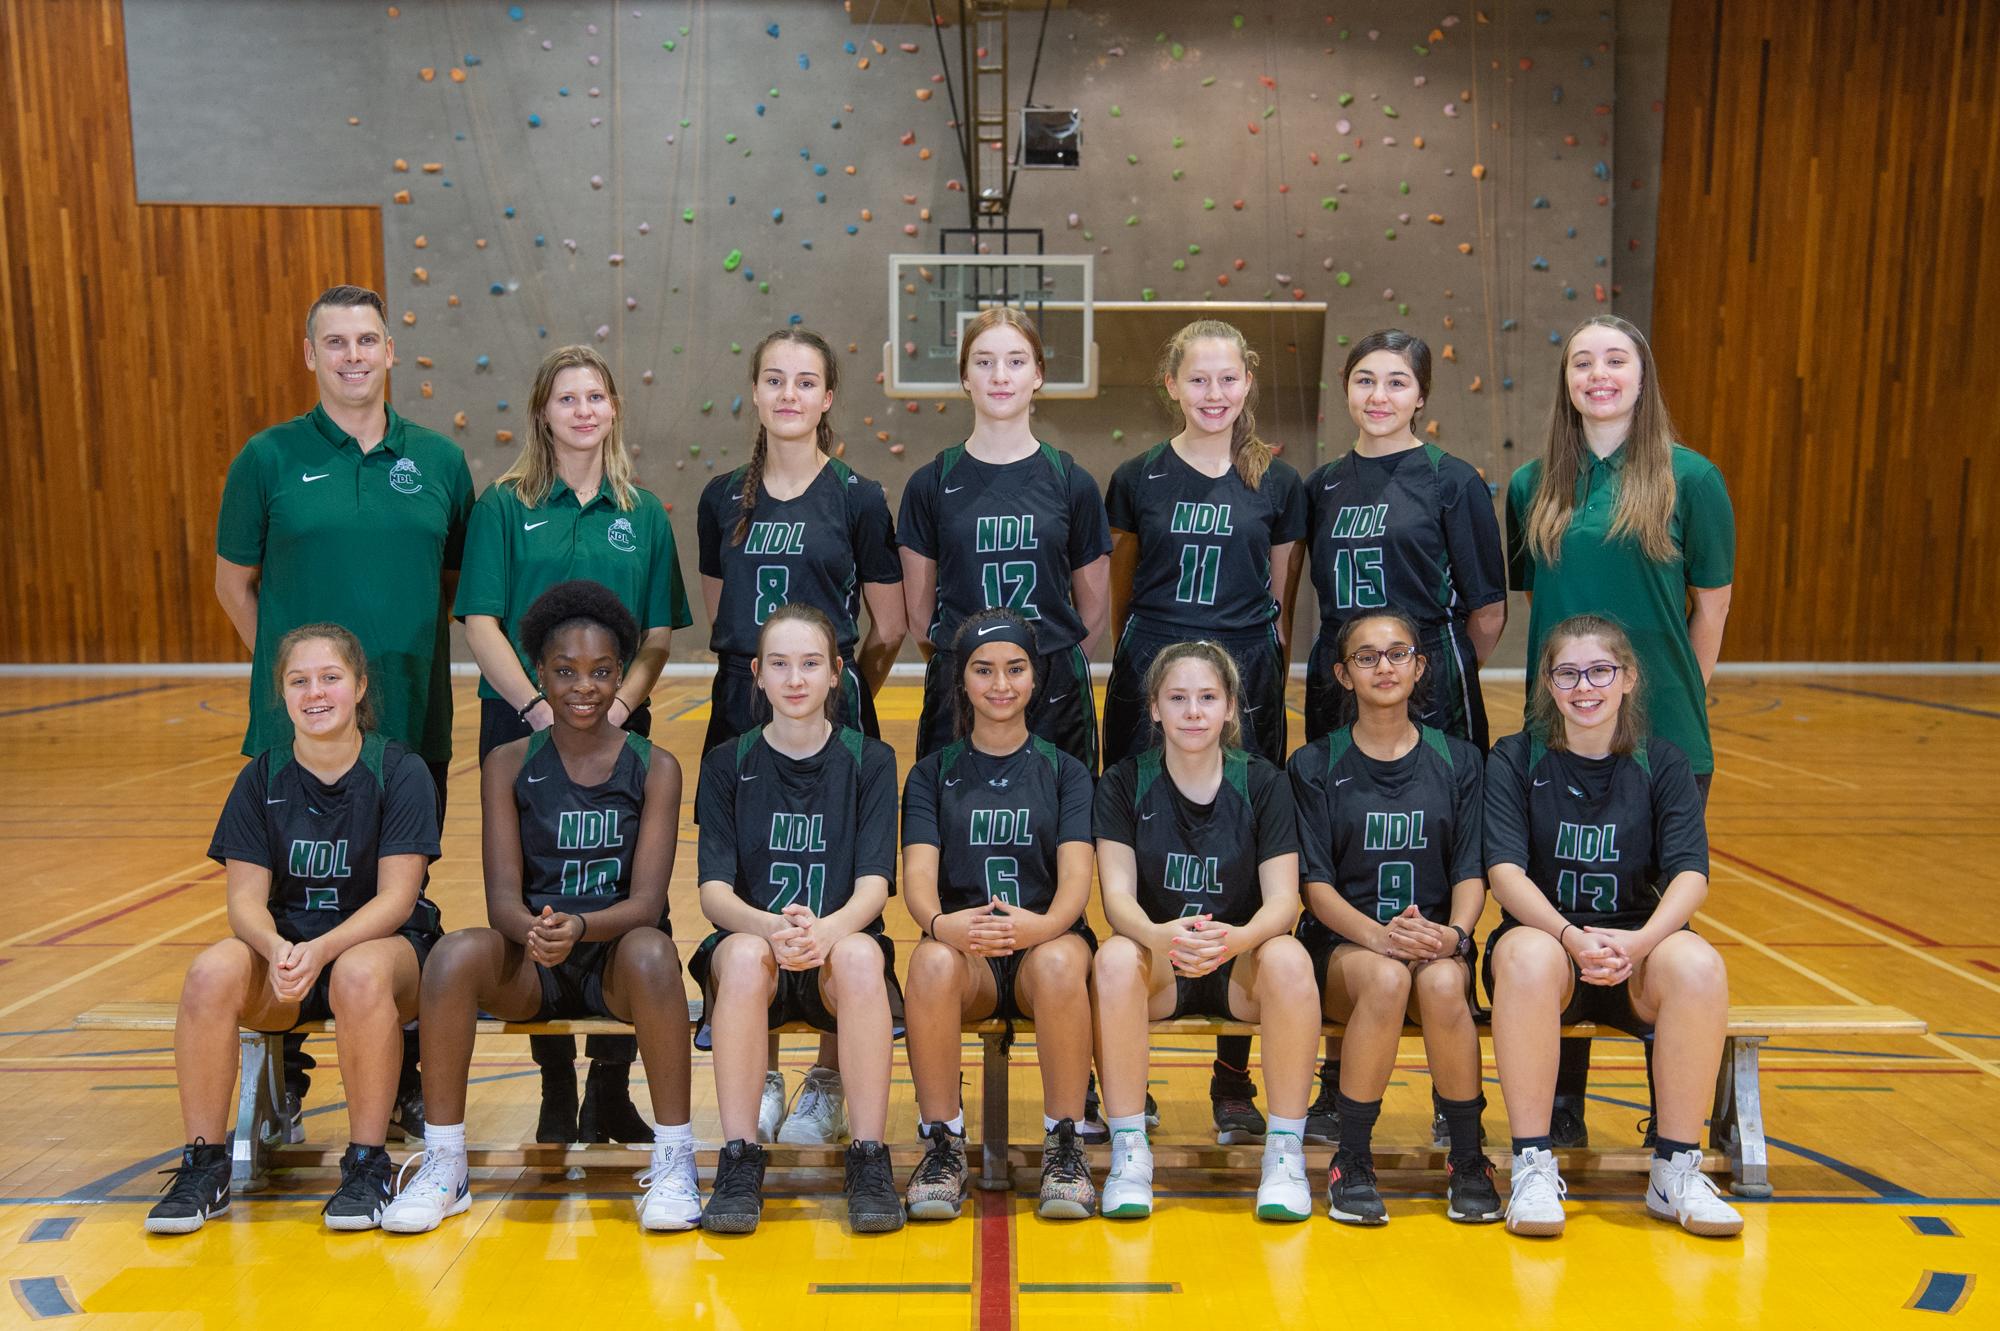 NDL_Preds 2019-2020 Basket CFD1